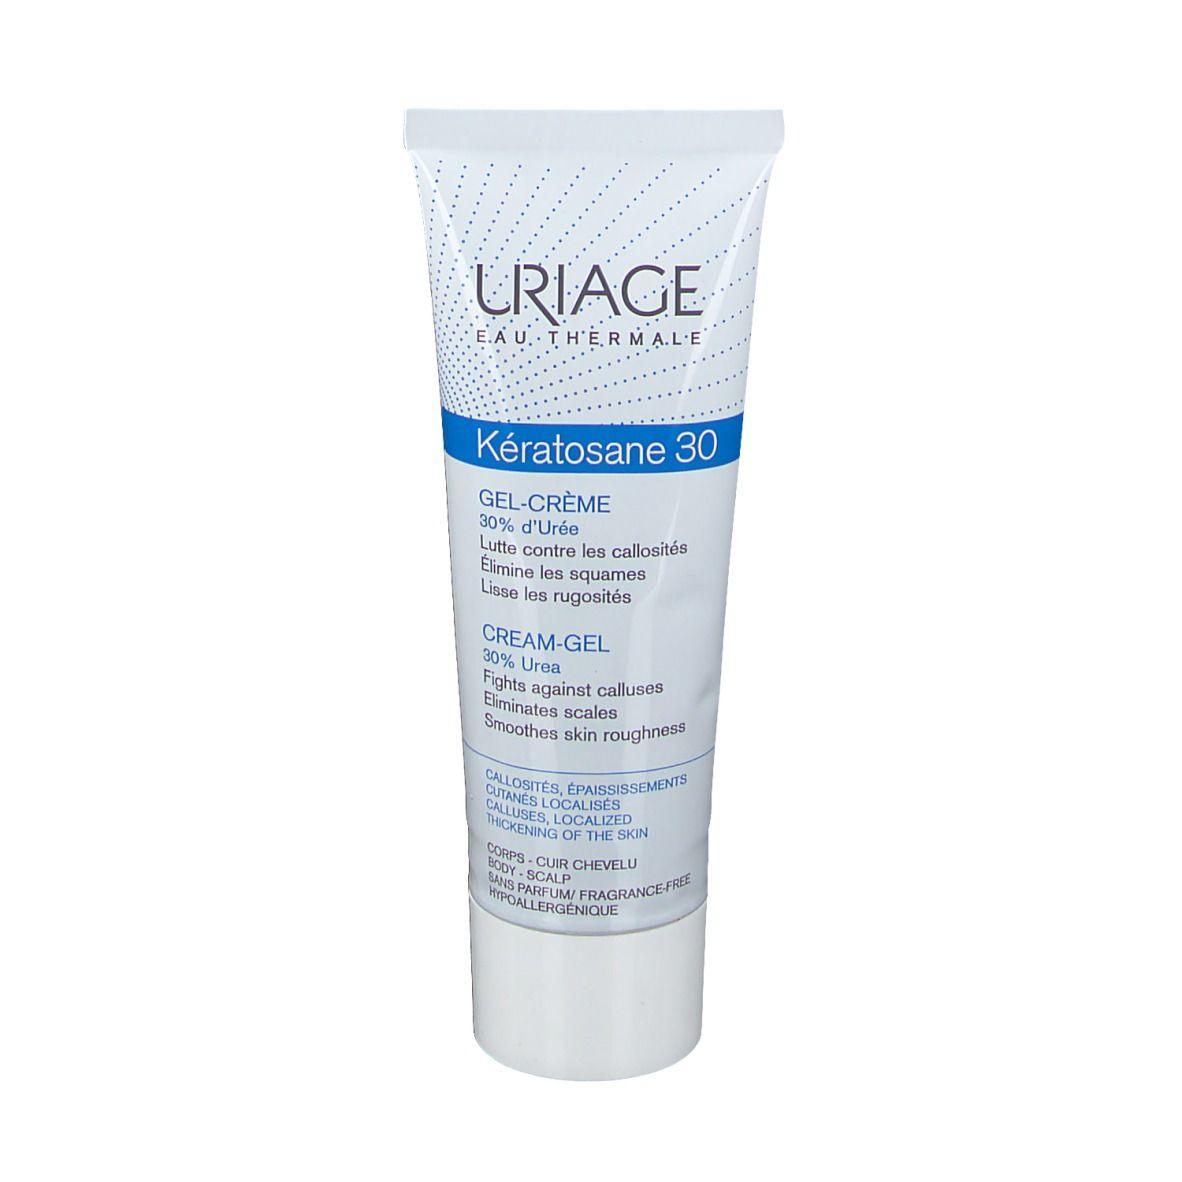 Uriage Kératosene30 Gel-Crema Cheratolitico 75 ml Crema